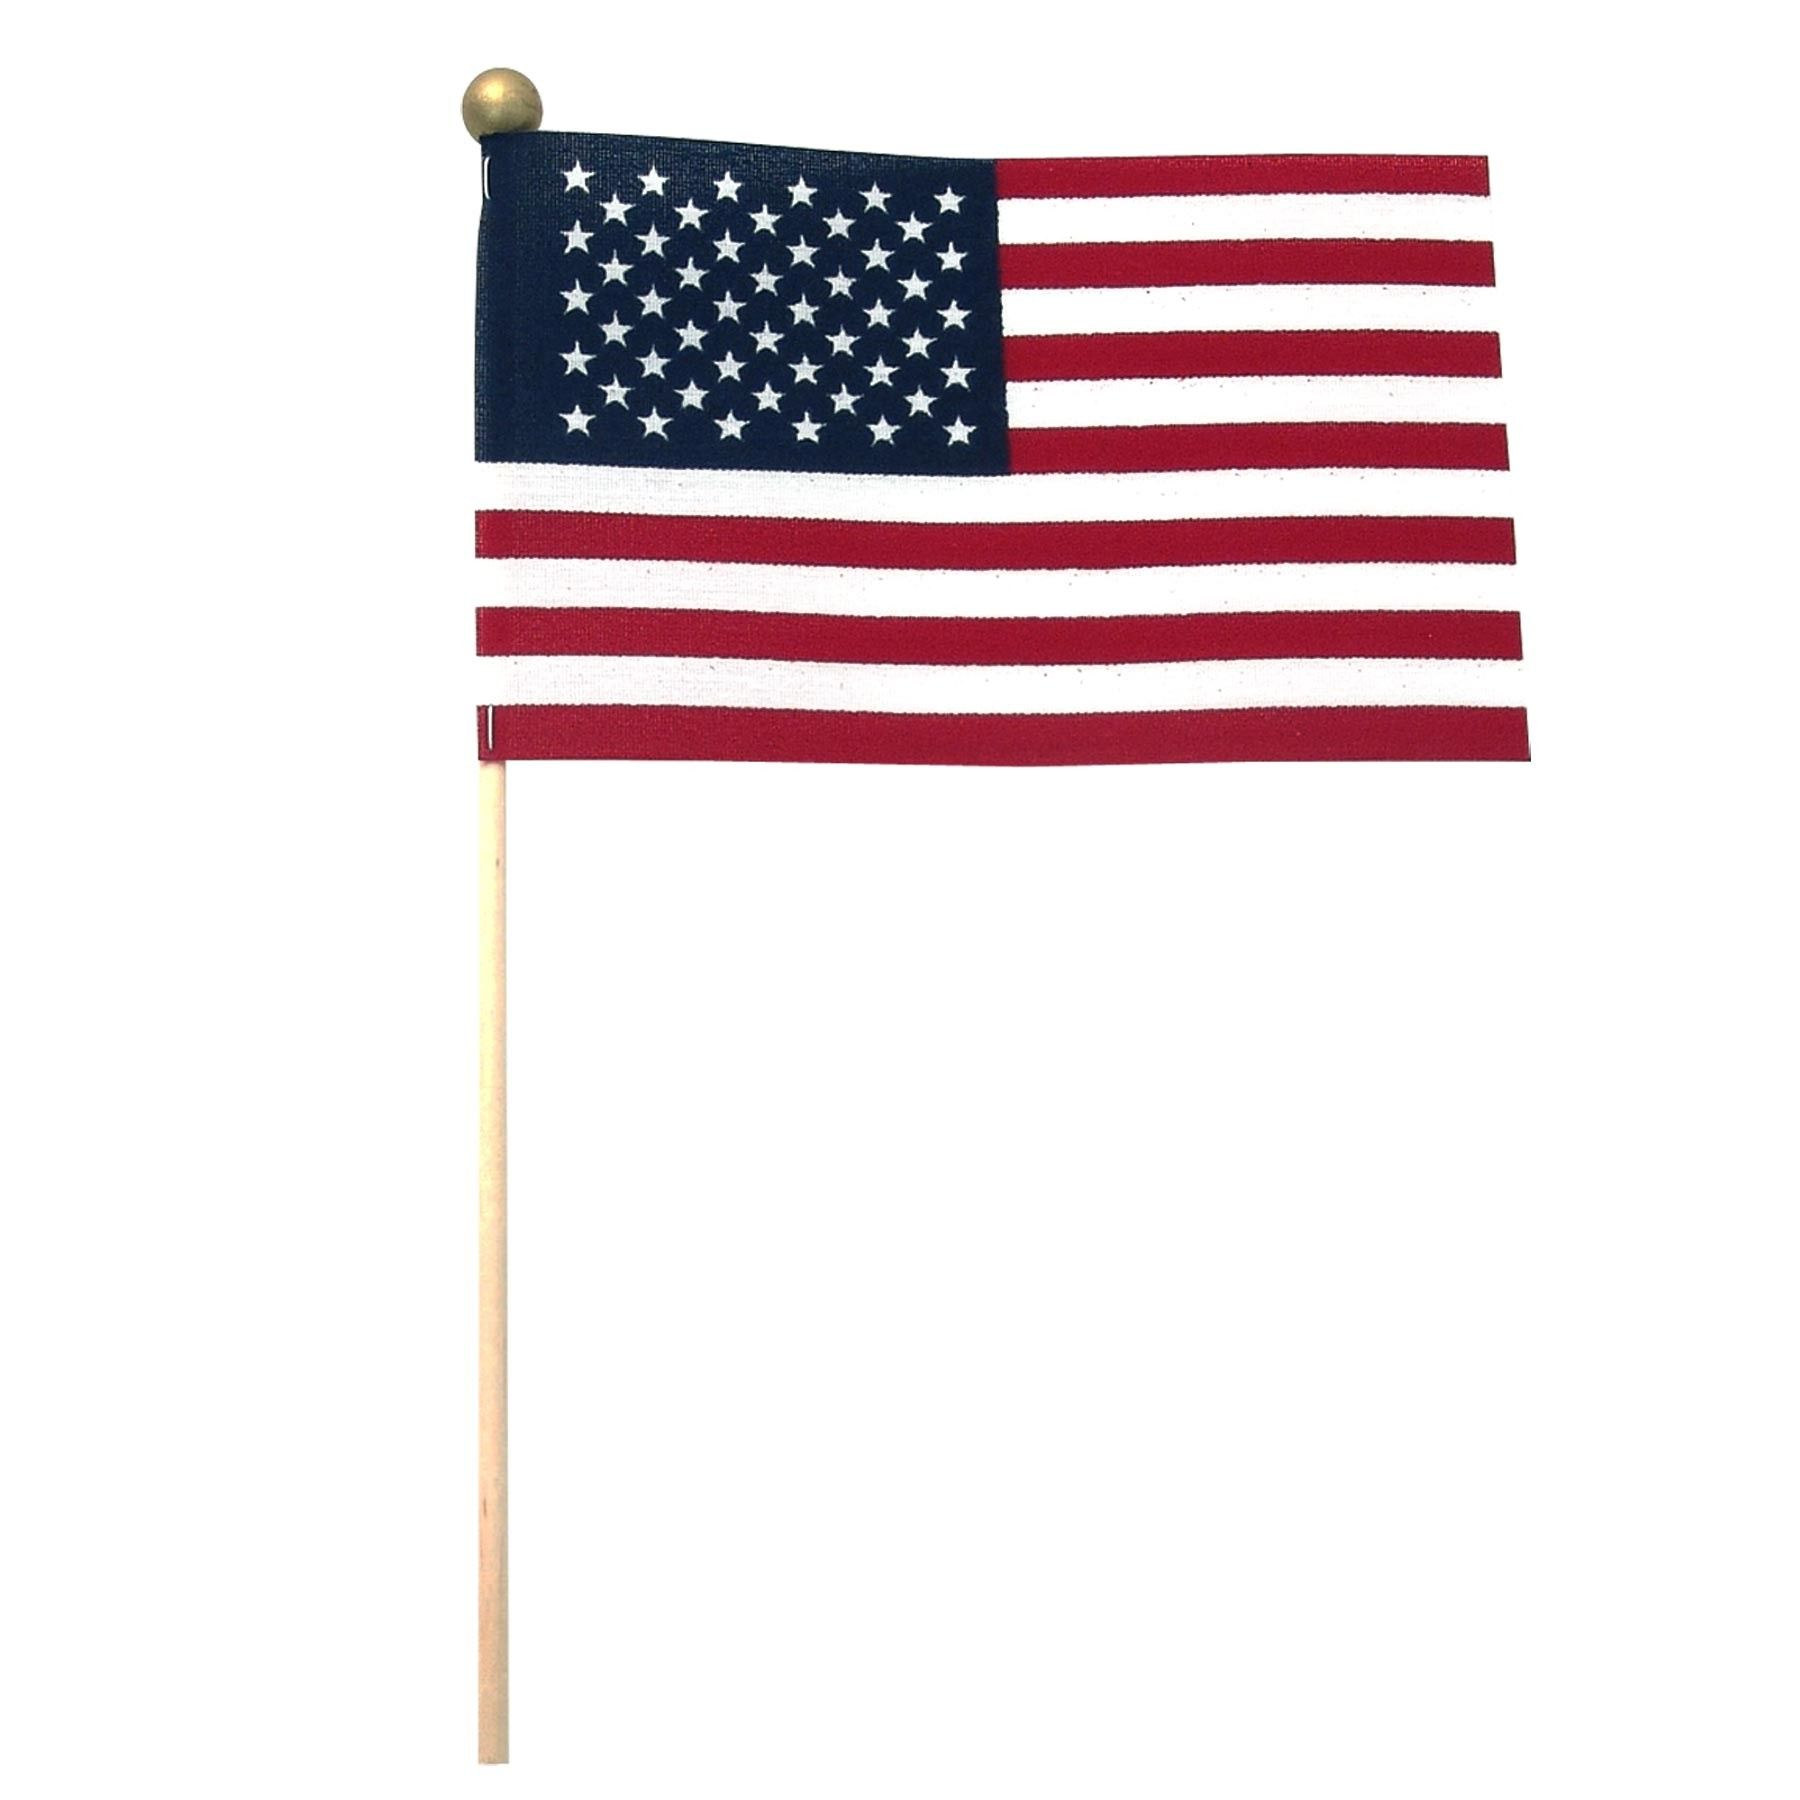 Super Tough 4 X 6 Stick Flag Standard With Ball Tip Flag Store Flag Flag Sizes